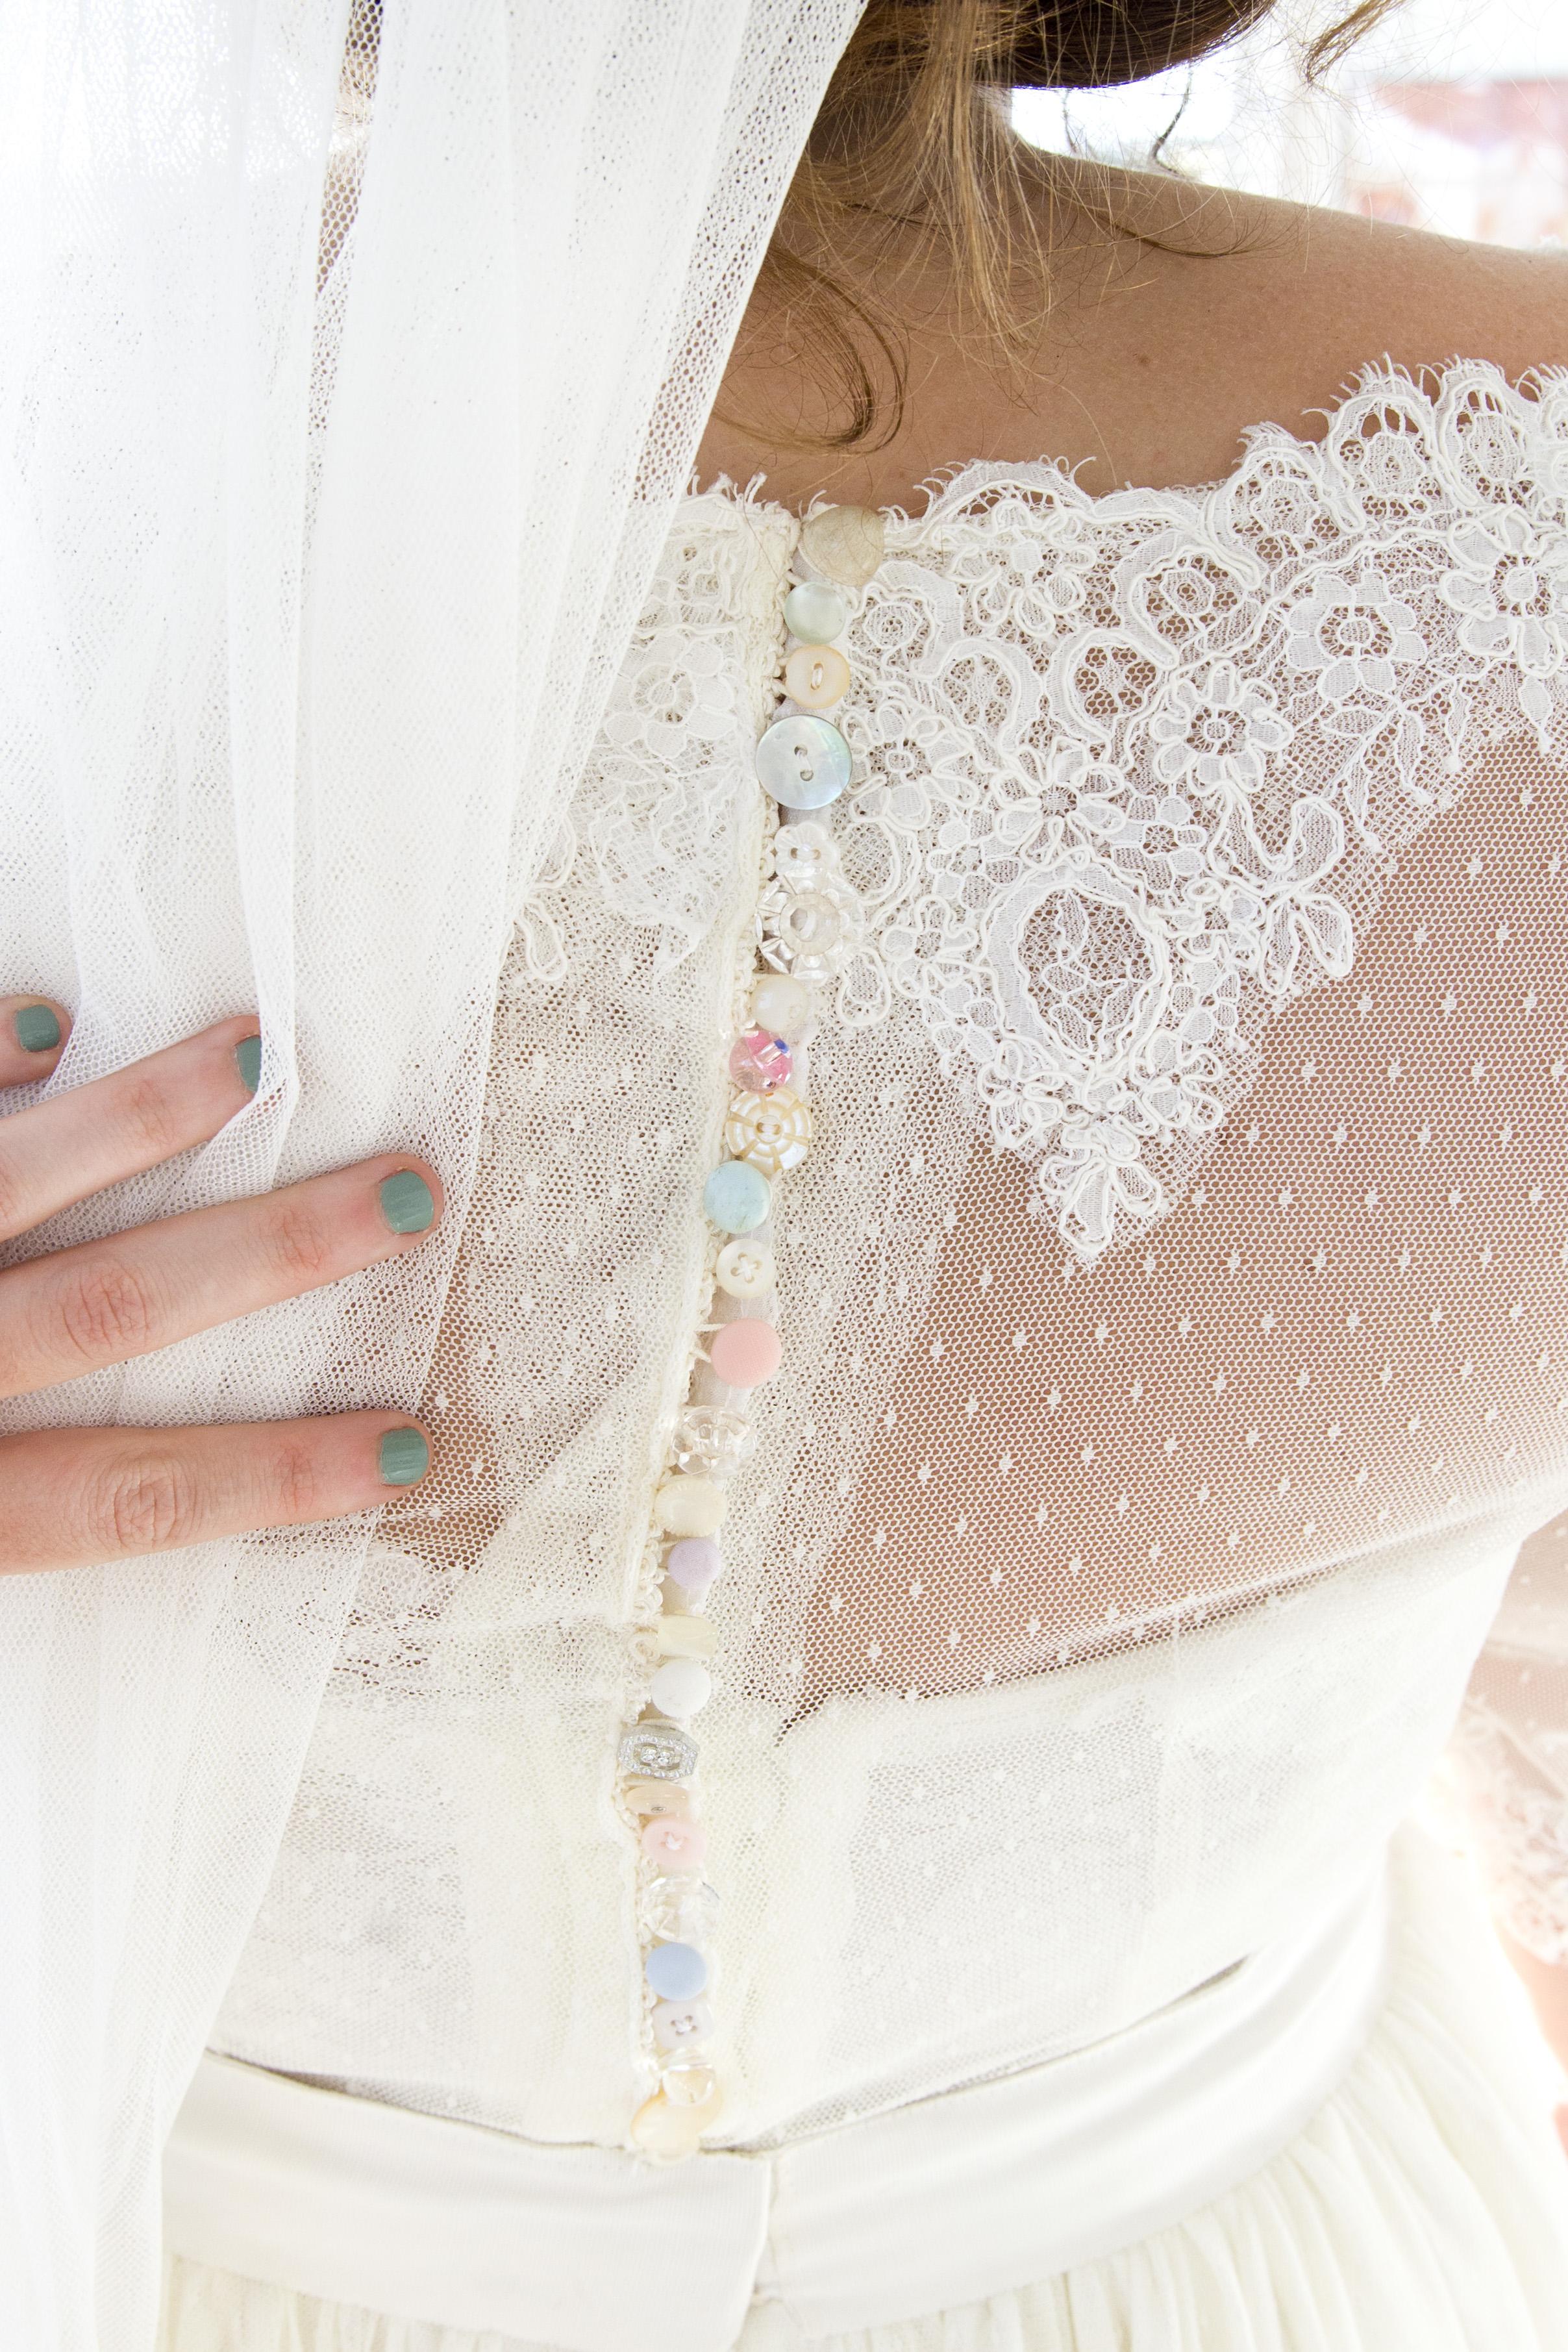 Caroline-Kilgore-photography-ivory-and-beau-bridal-boutique-savannah-wedding-dresses-savannah-bridal-boutique-savannah-wedding-gowns-custom-wedding-dress-vintage-wedding-dress-swiss-dot-wedding-dress-shrimp-boat-wedding-5.jpg